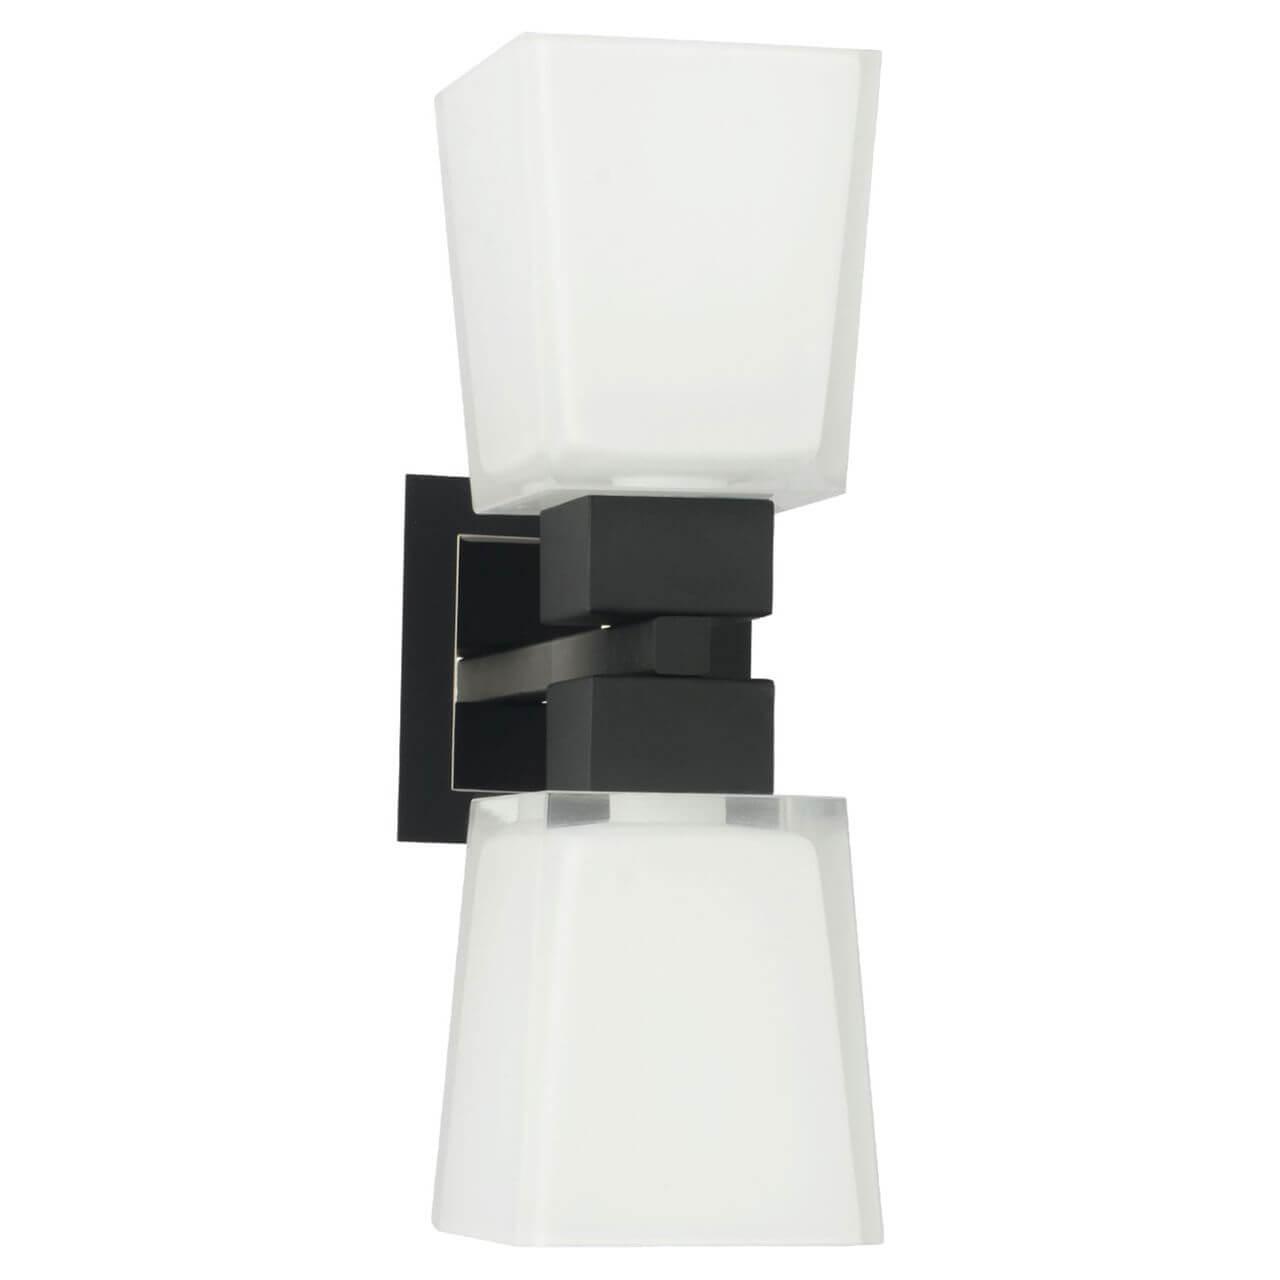 Бра Lussole LSC-2501-02, E14, 60 Вт бра torricella lsc 1811 02